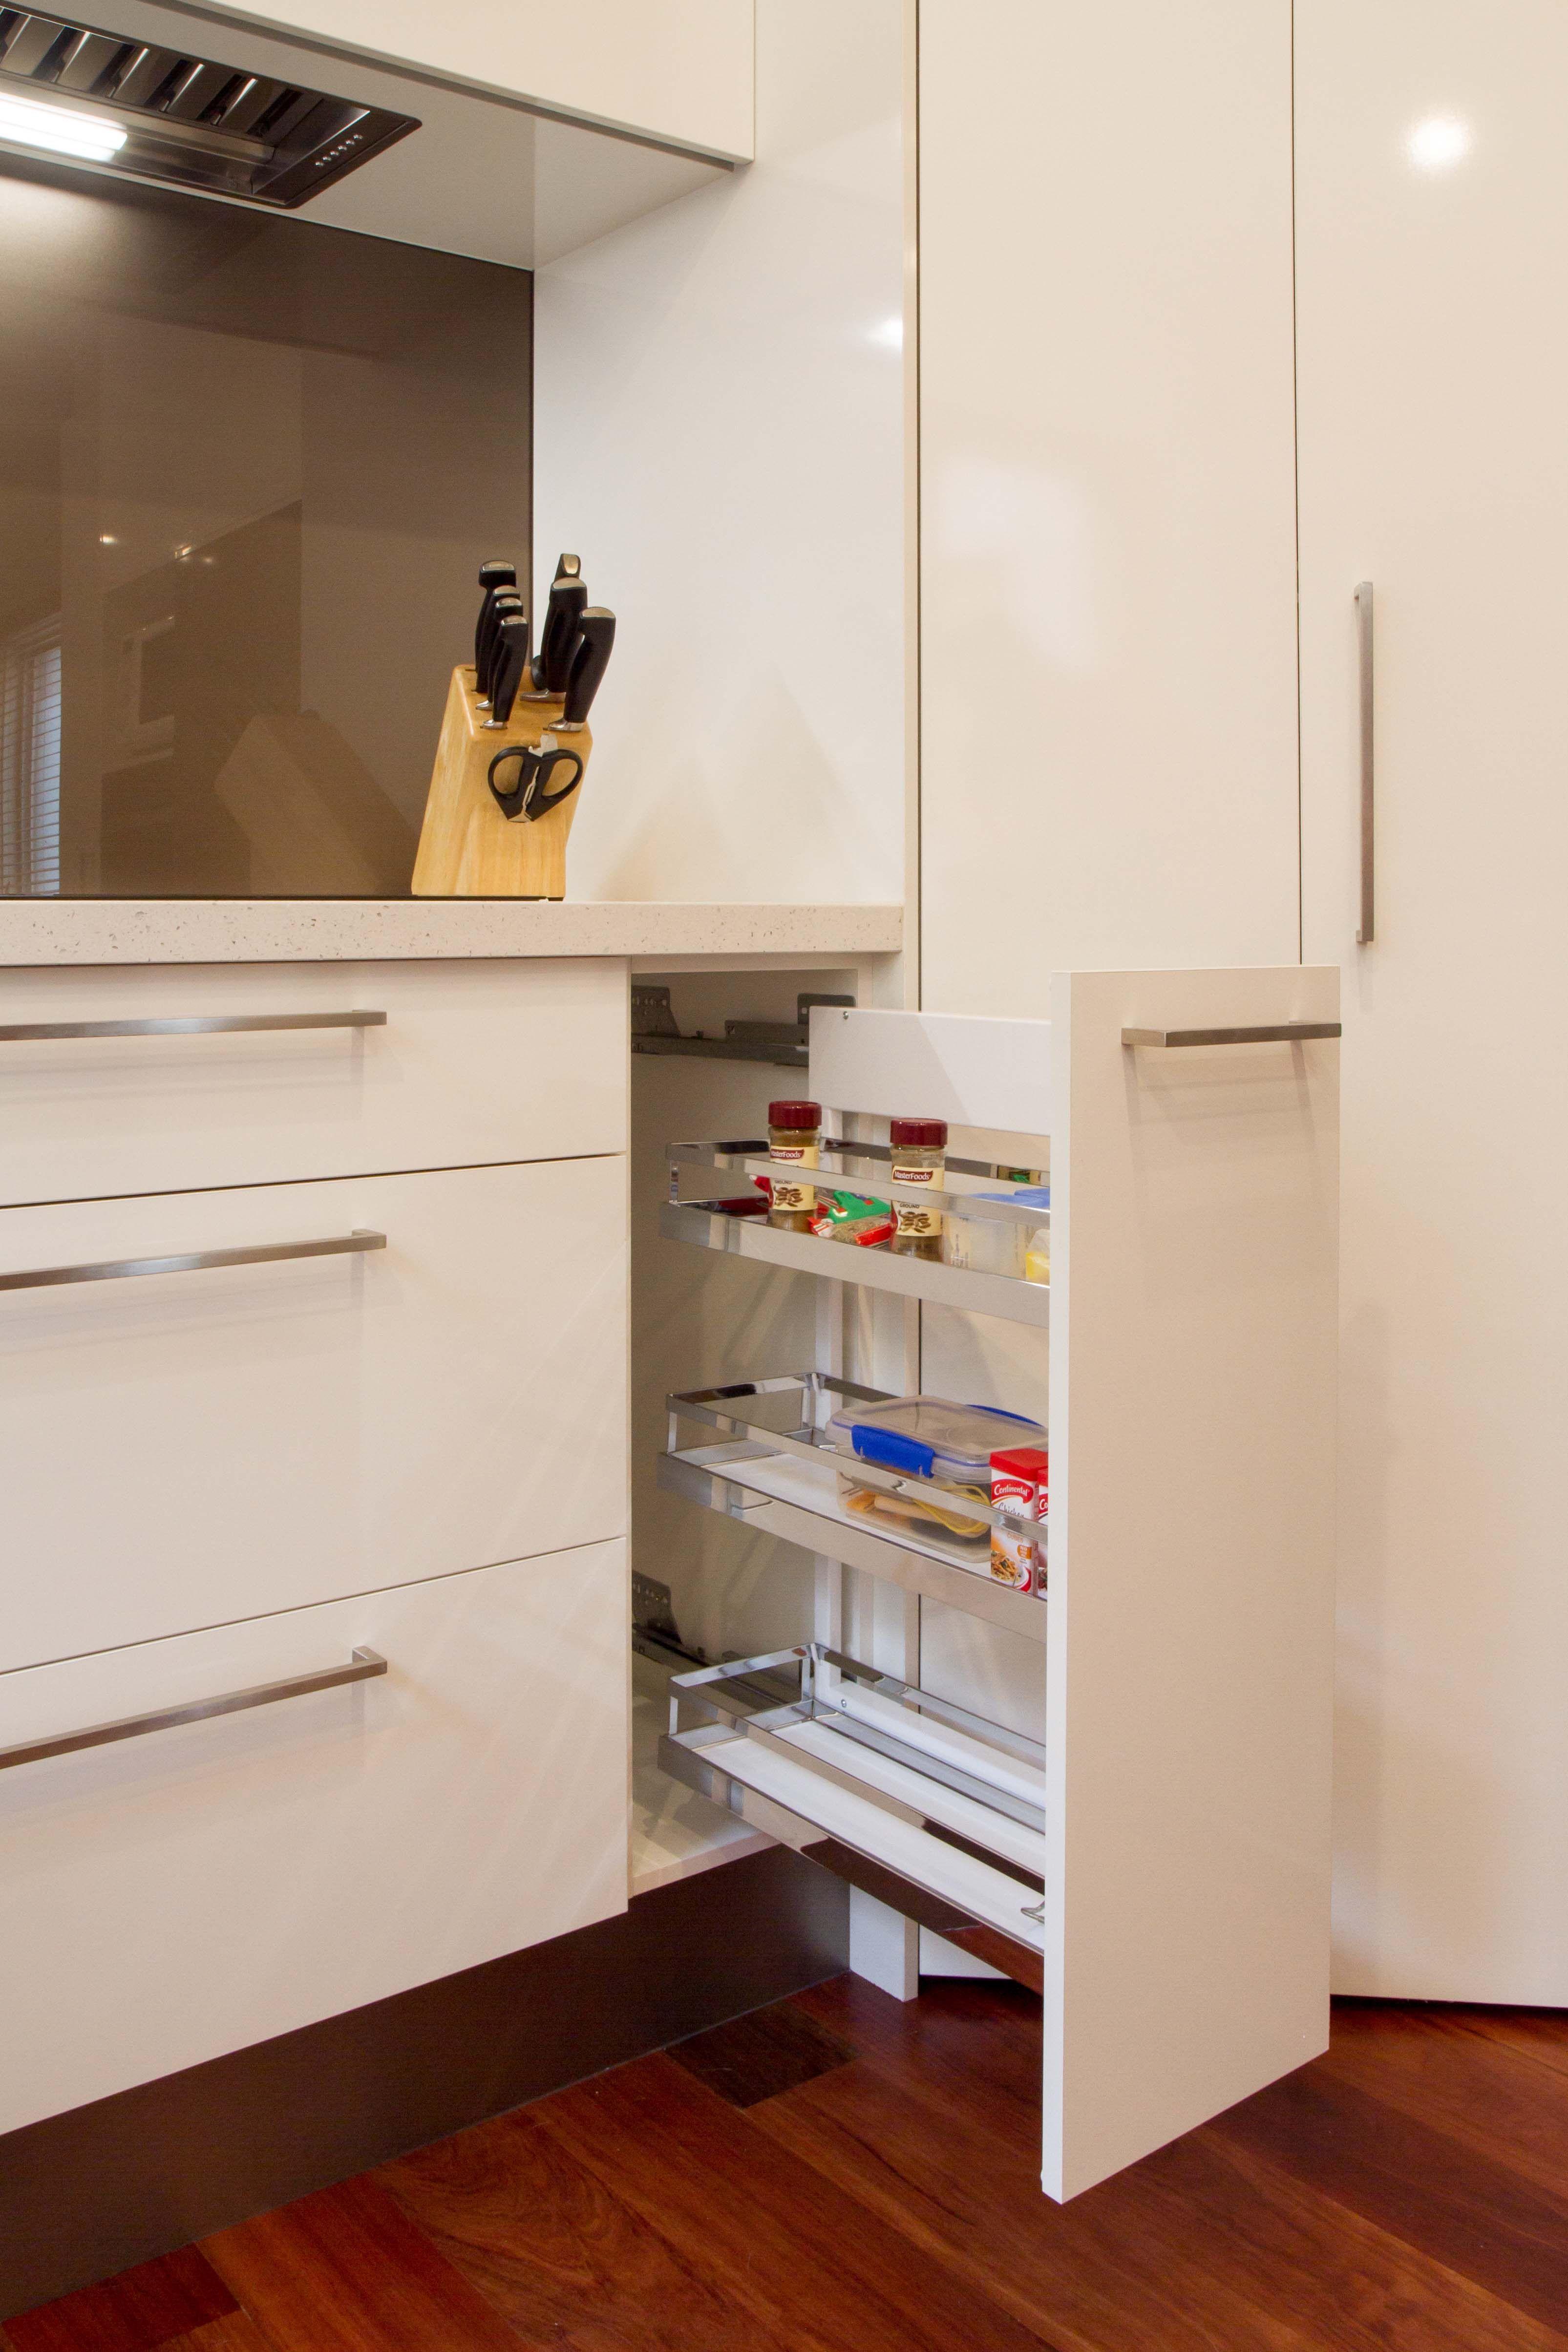 Kitchen Craft Cabinets Kitchen Craft Cabinets Contemporary Kitchen Cabinets Contemporary Kitchen